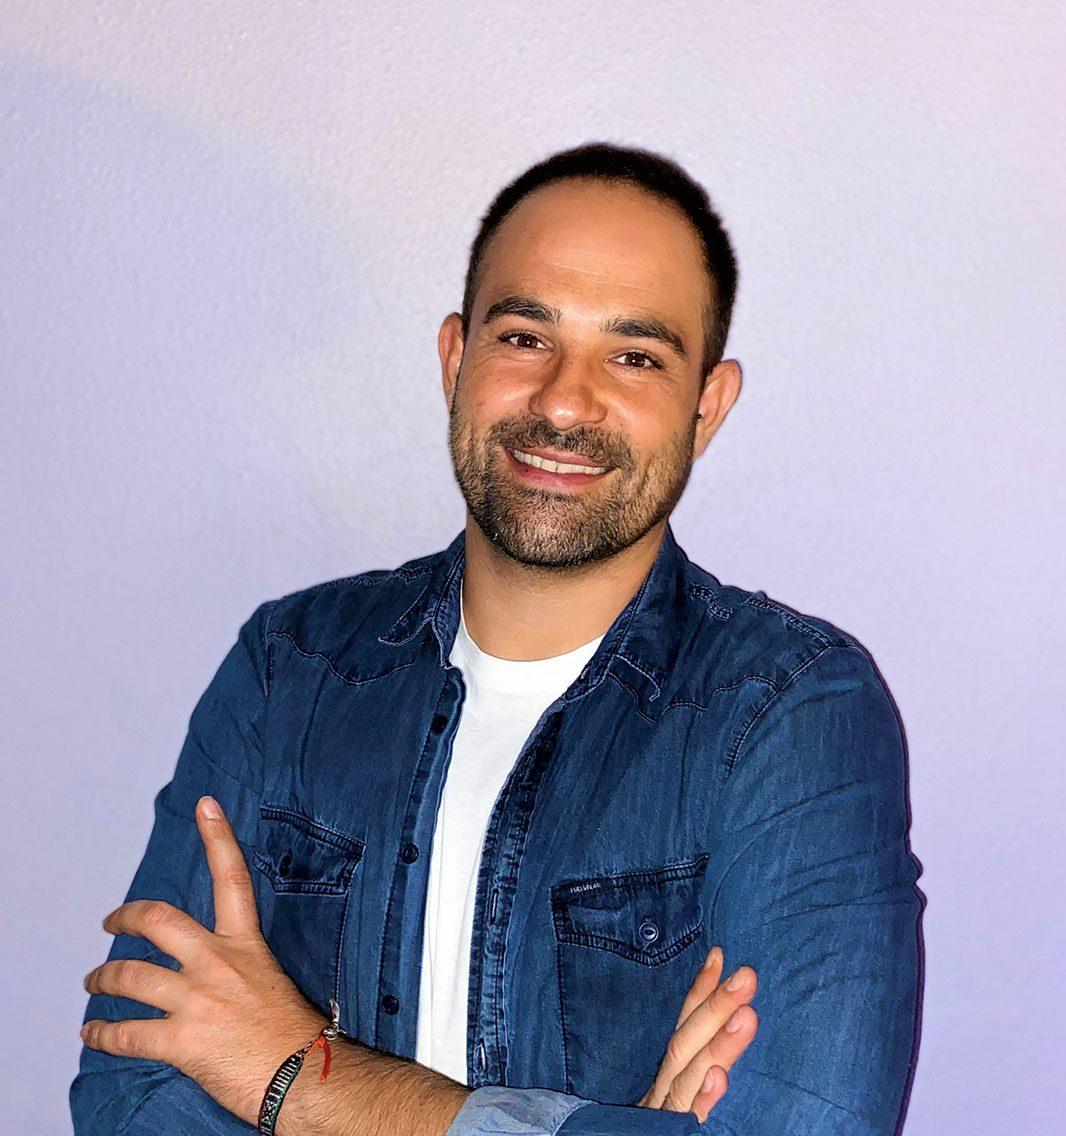 Juan Pedro Abellán